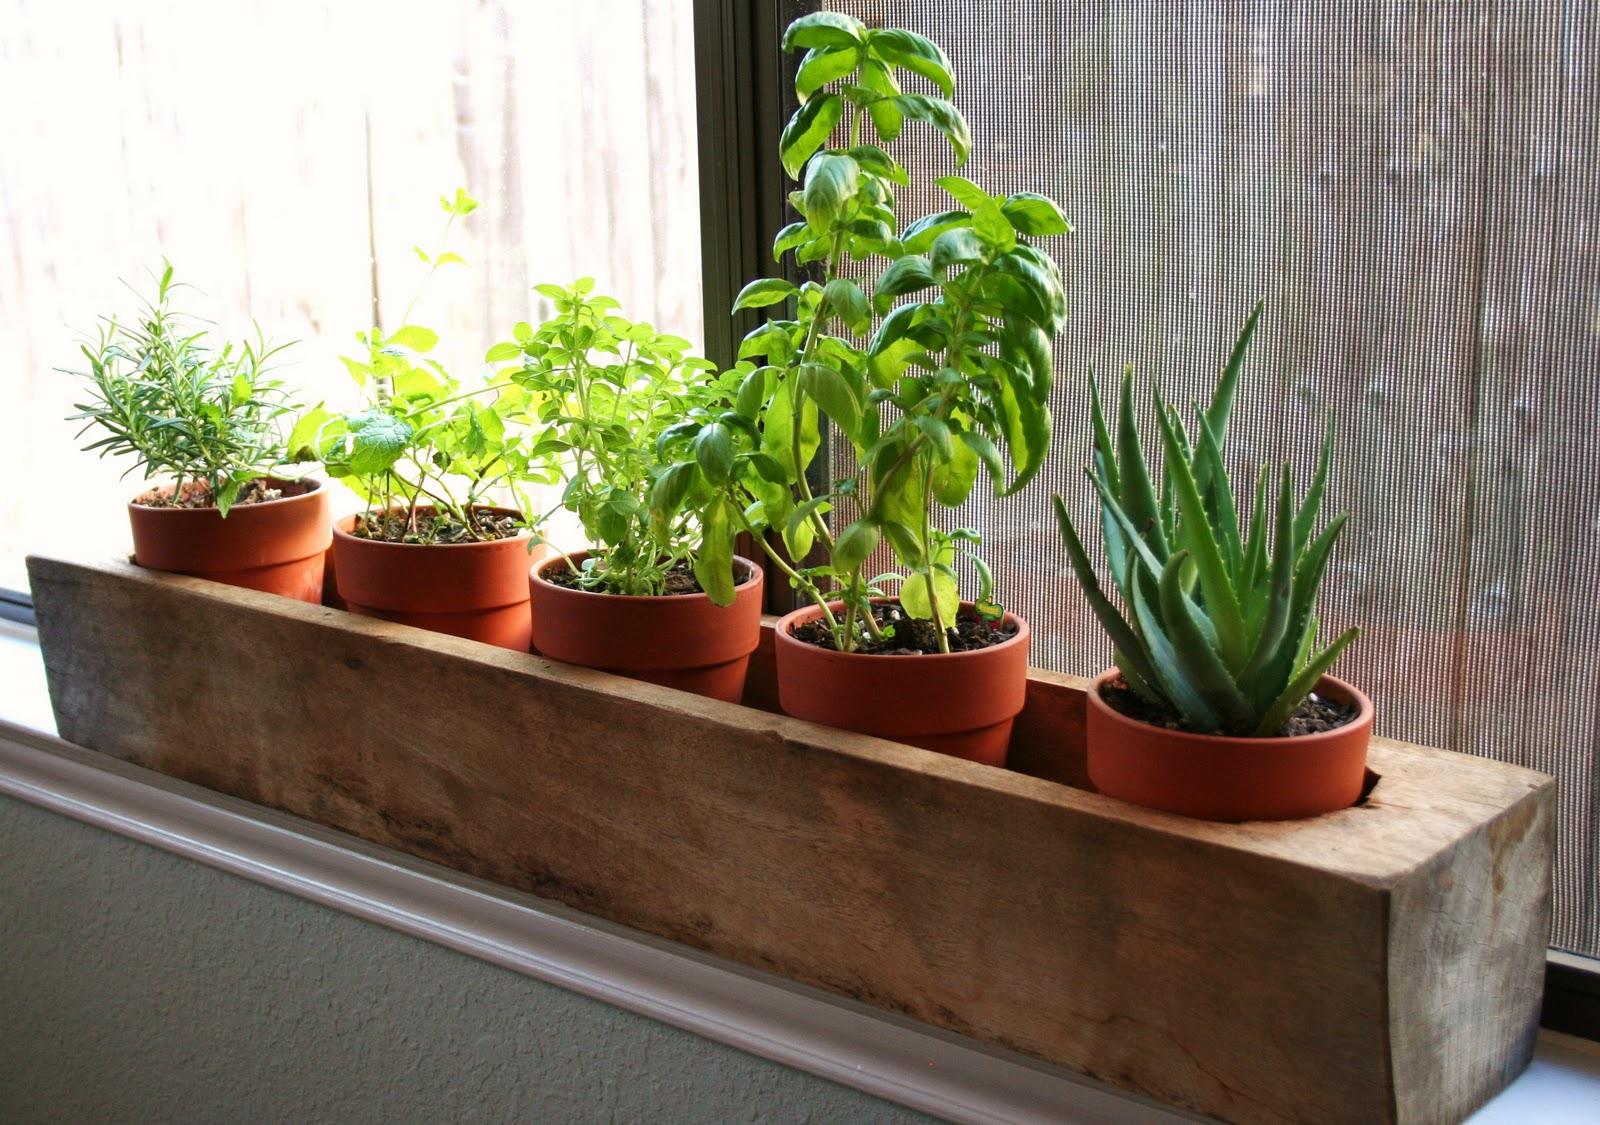 Windowsill Planter Raised Vegetable Garden Layout 4x8 Tag